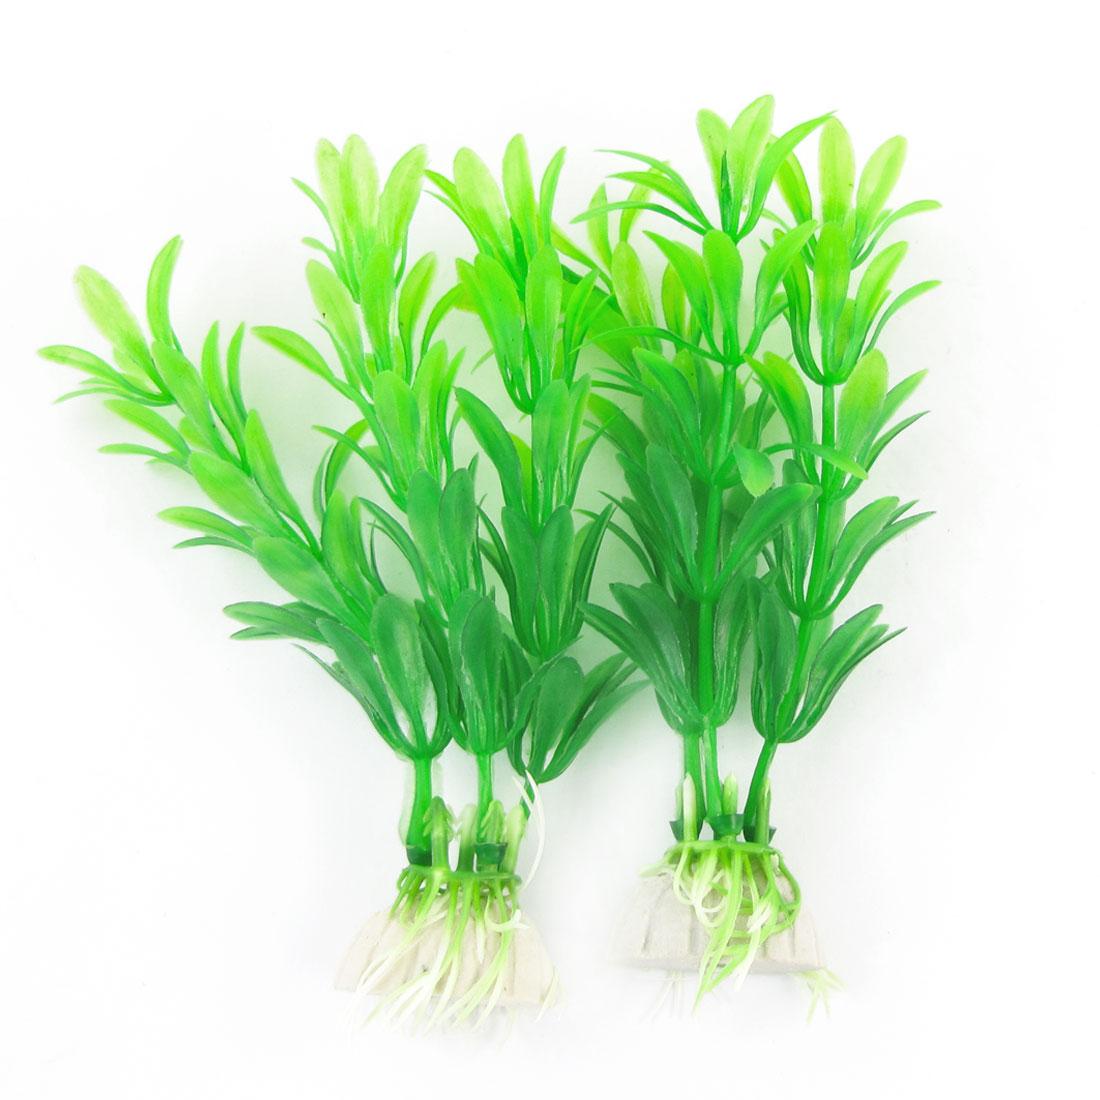 "2 Pcs Fish Tank Aquarium Landscaping Ceramic Base Green Grass Plant 5.1"" High"